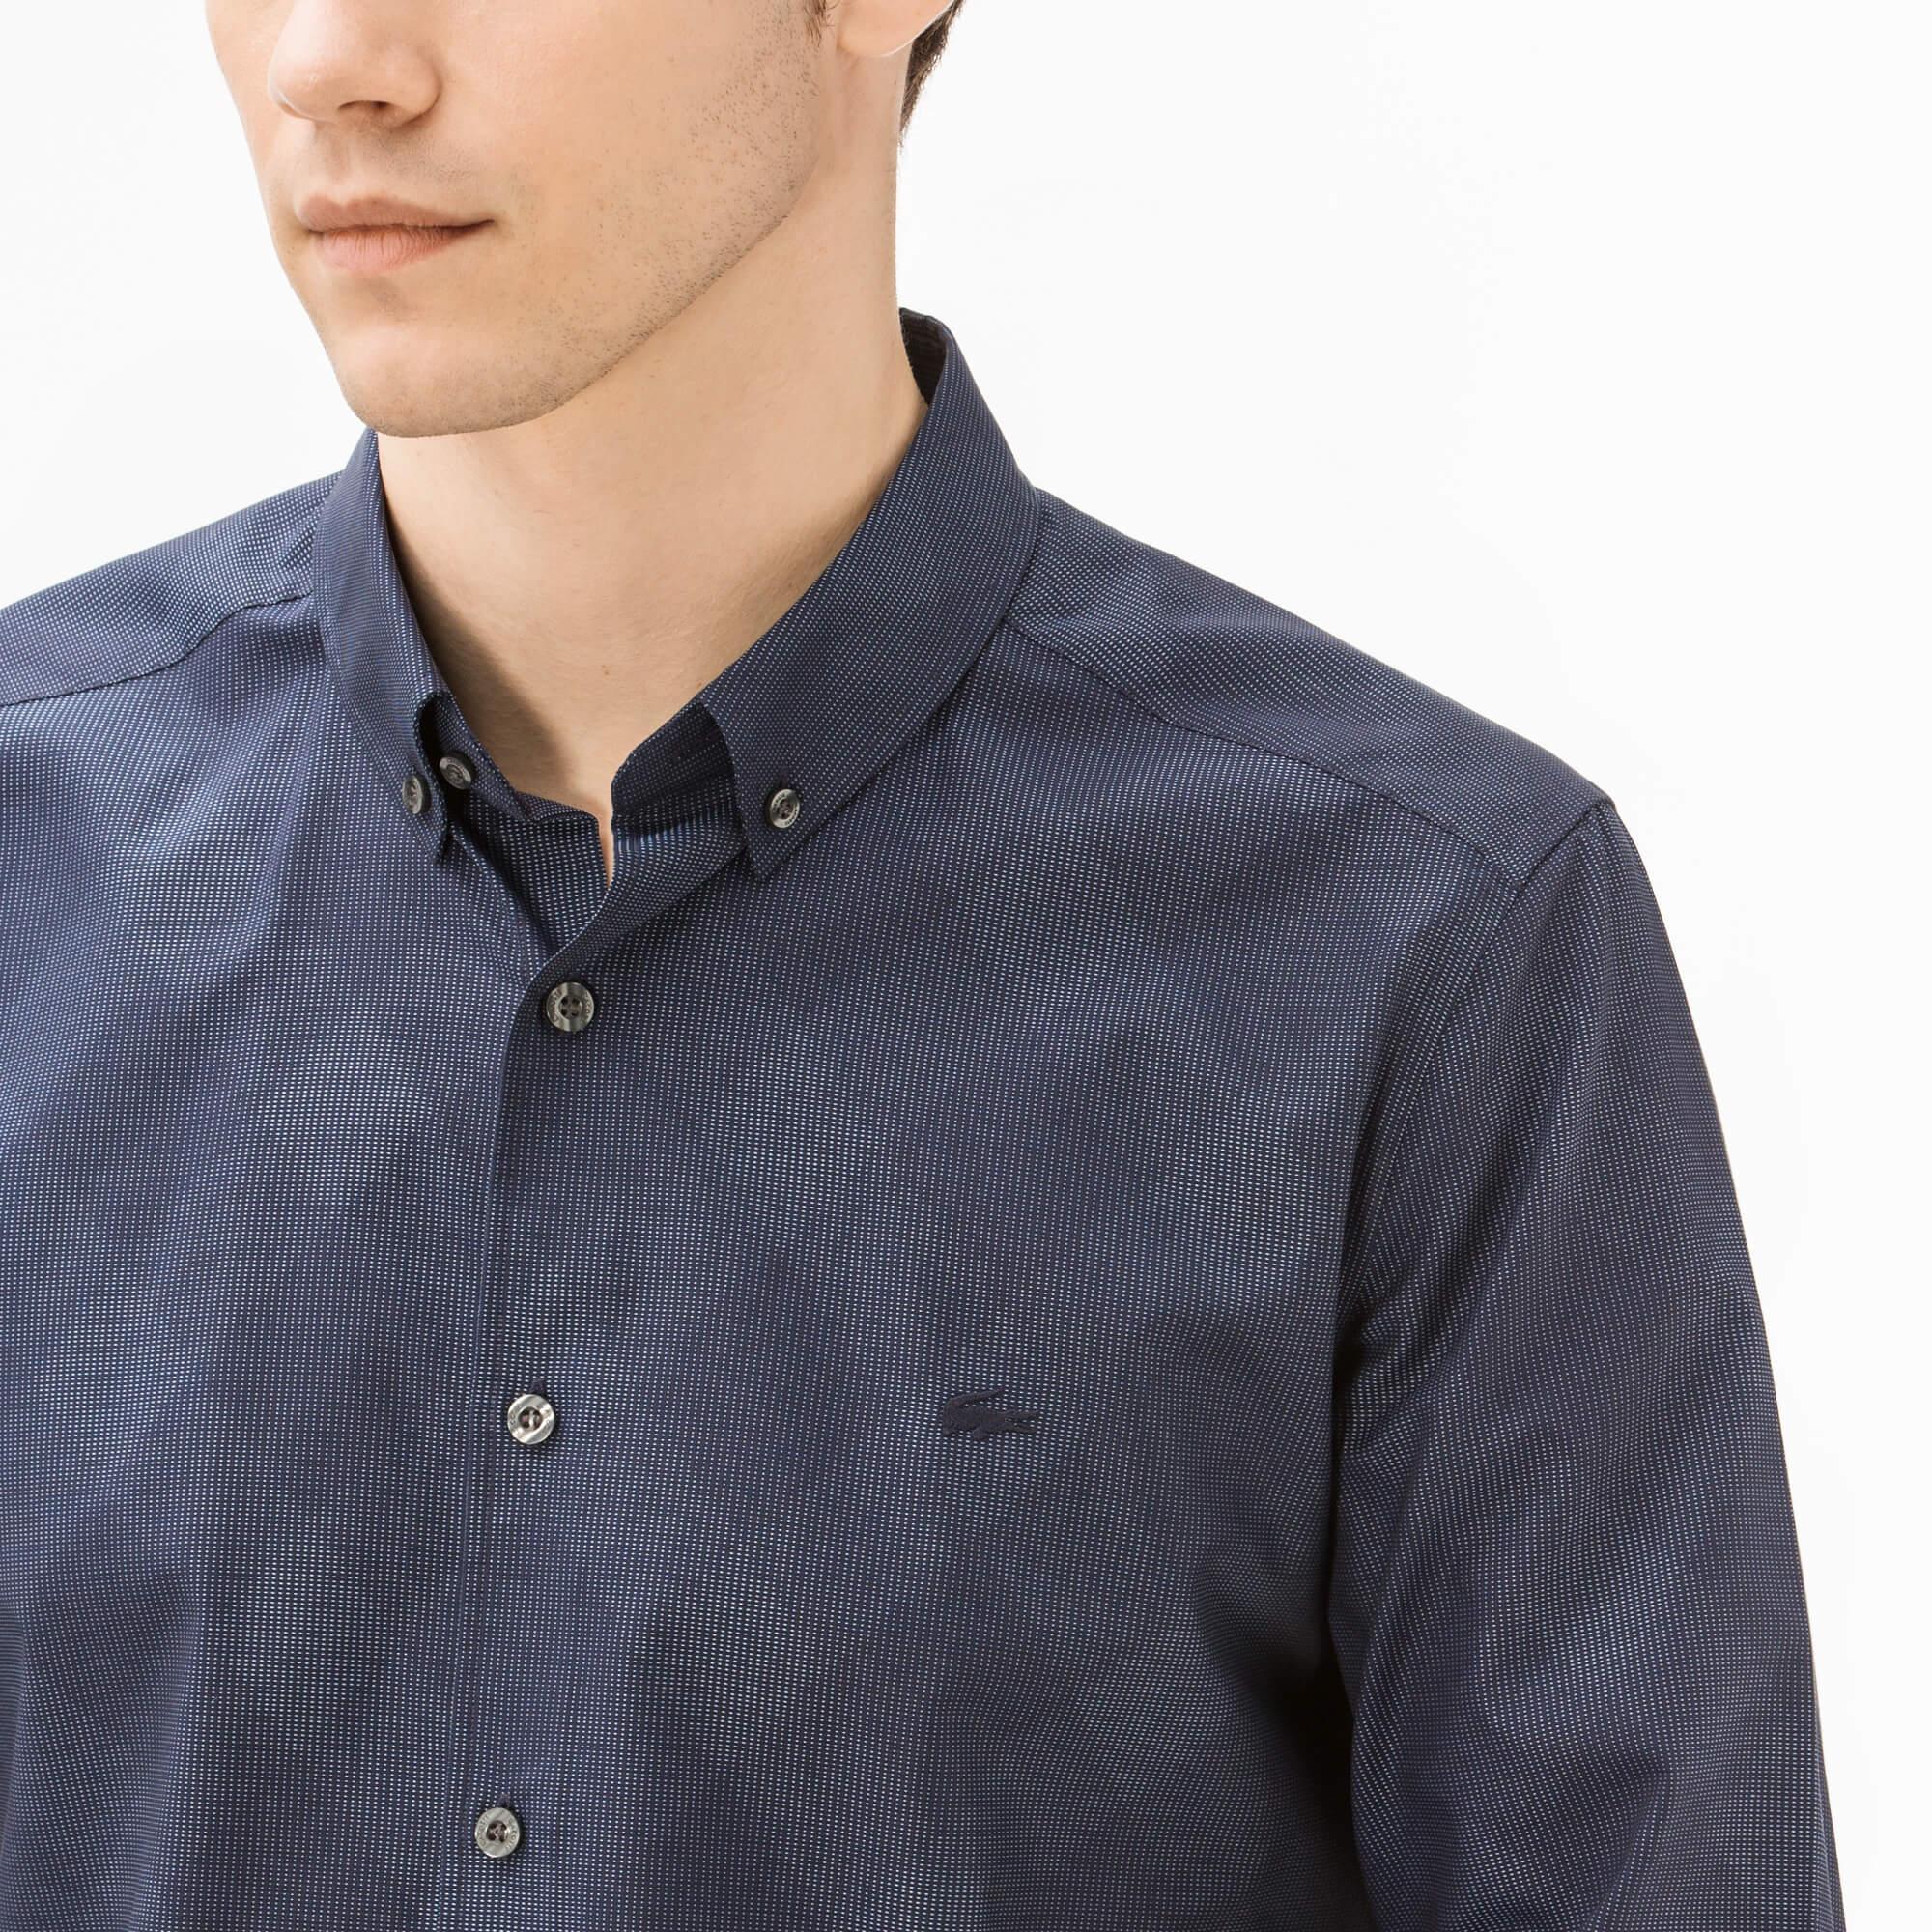 Lacoste Erkek Slim Fit Lacivert Ekose Gömlek